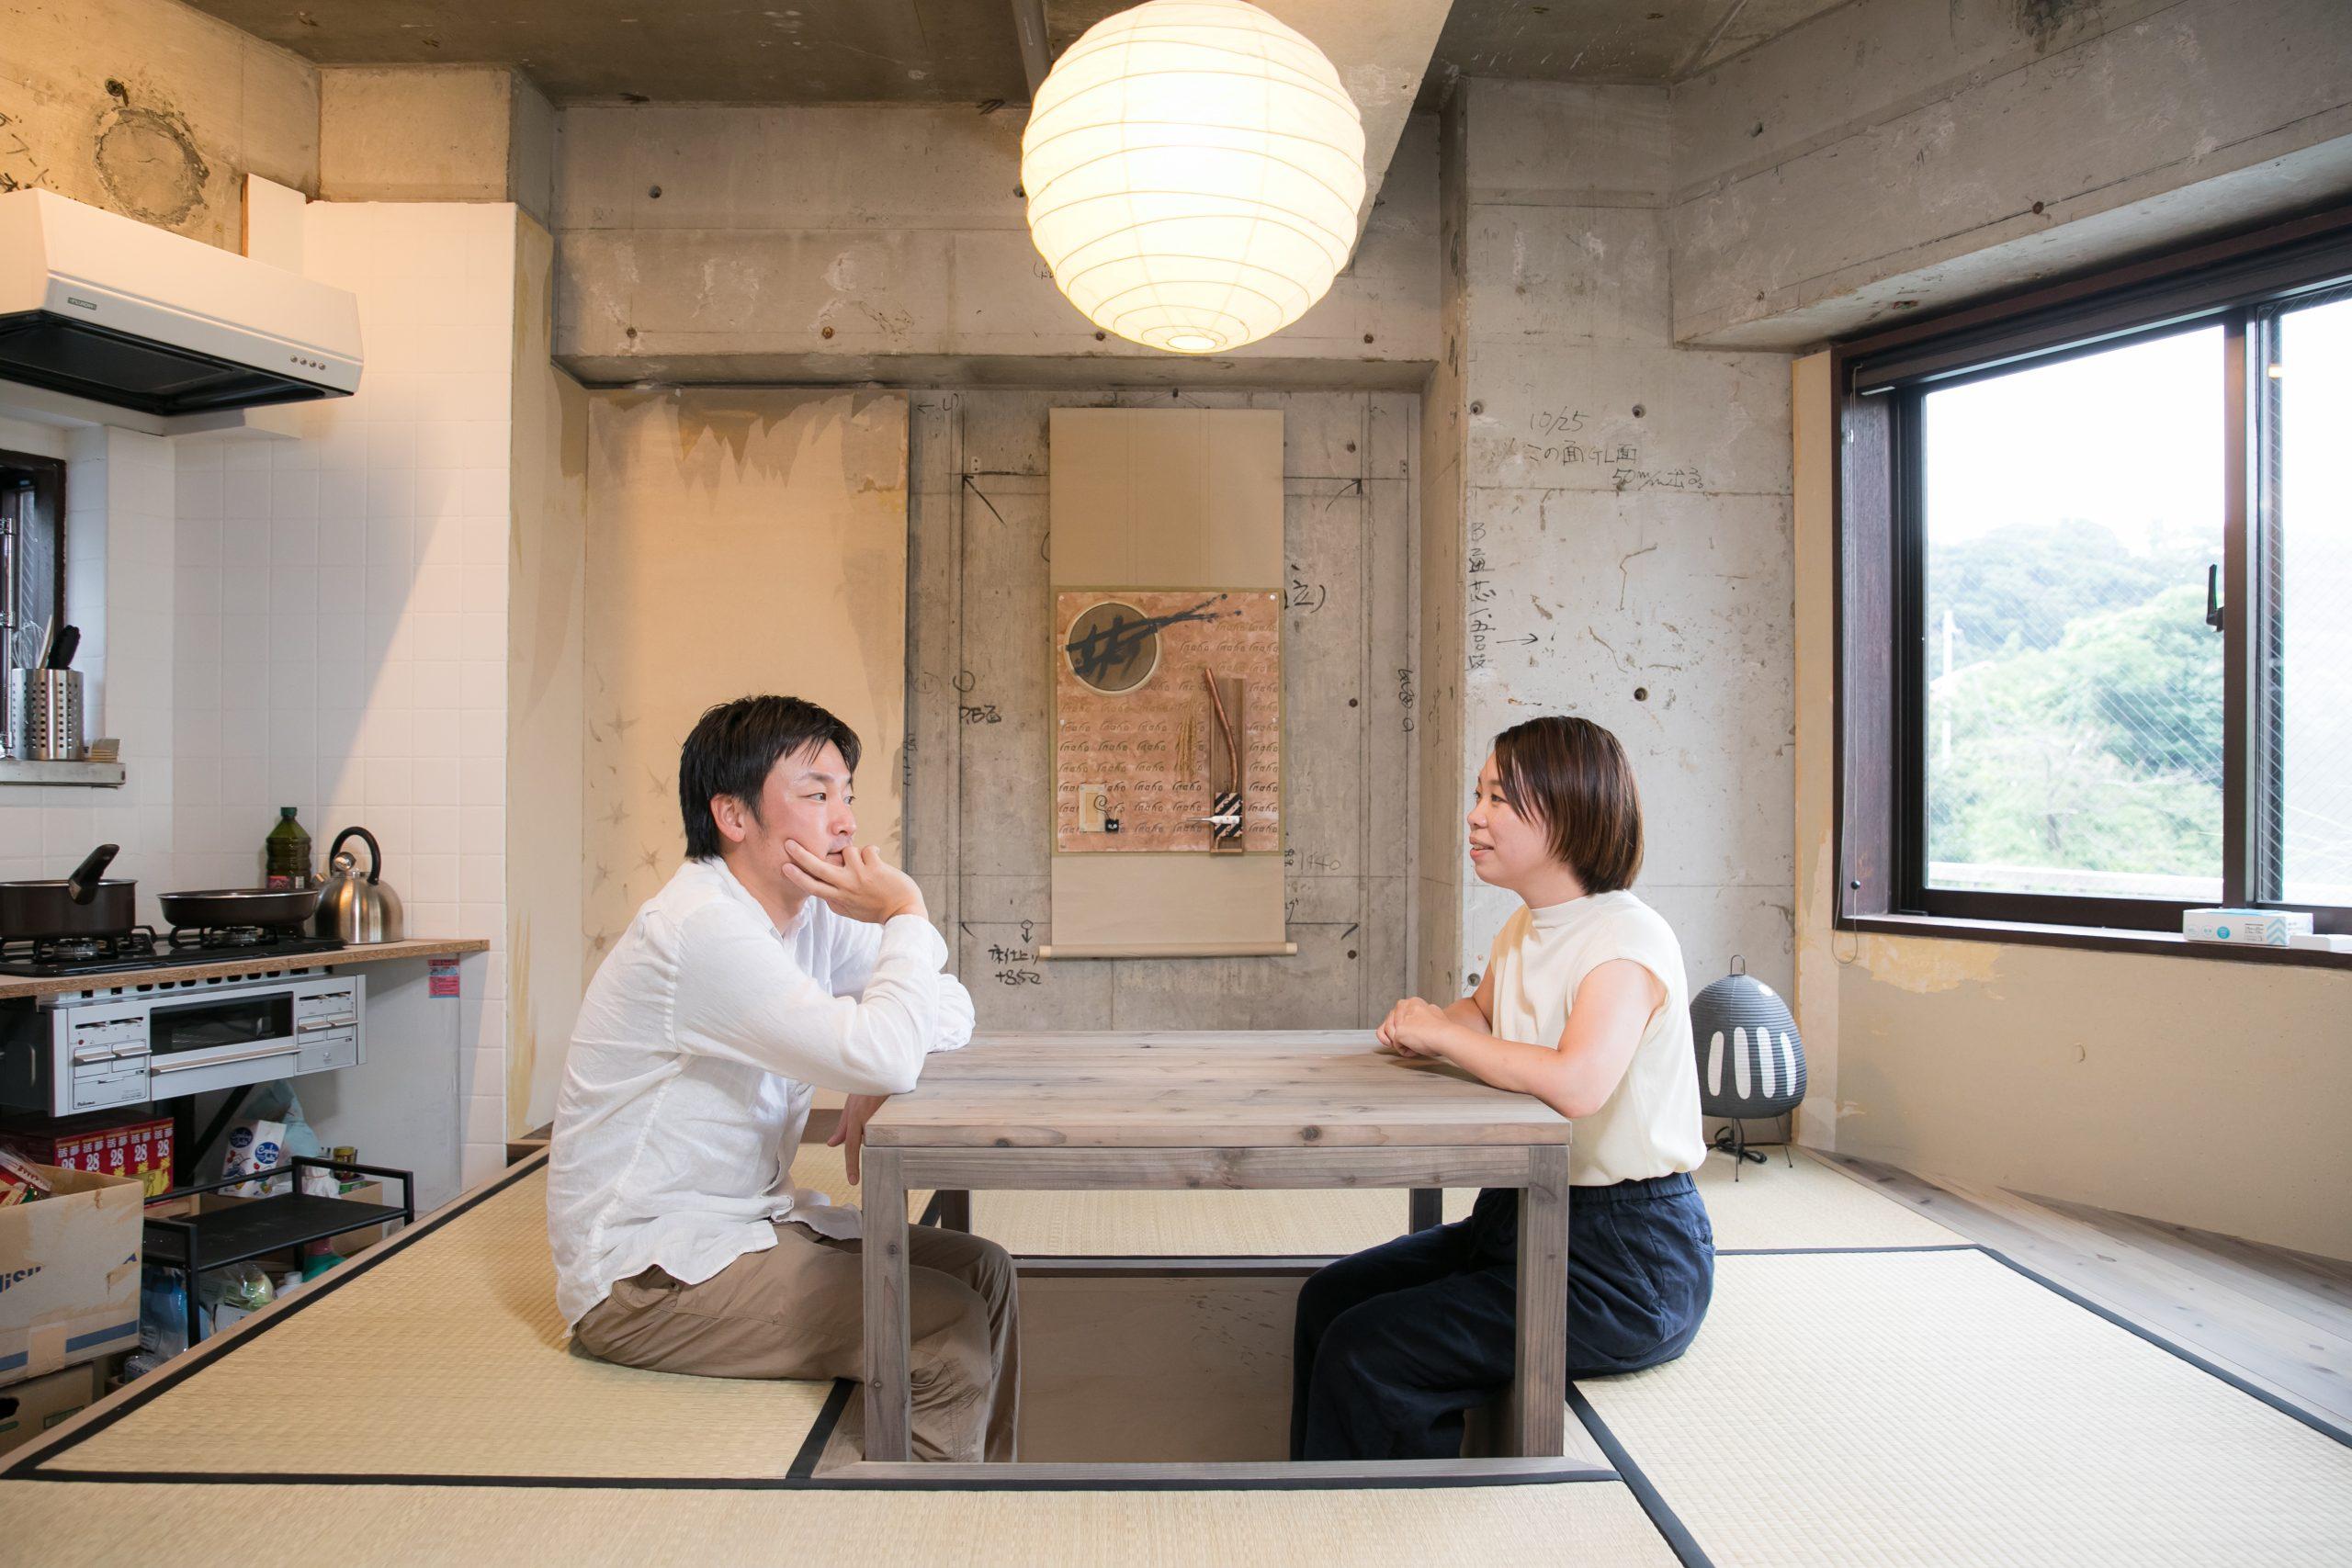 inaho株式会社オフィスにある奥座敷で会話